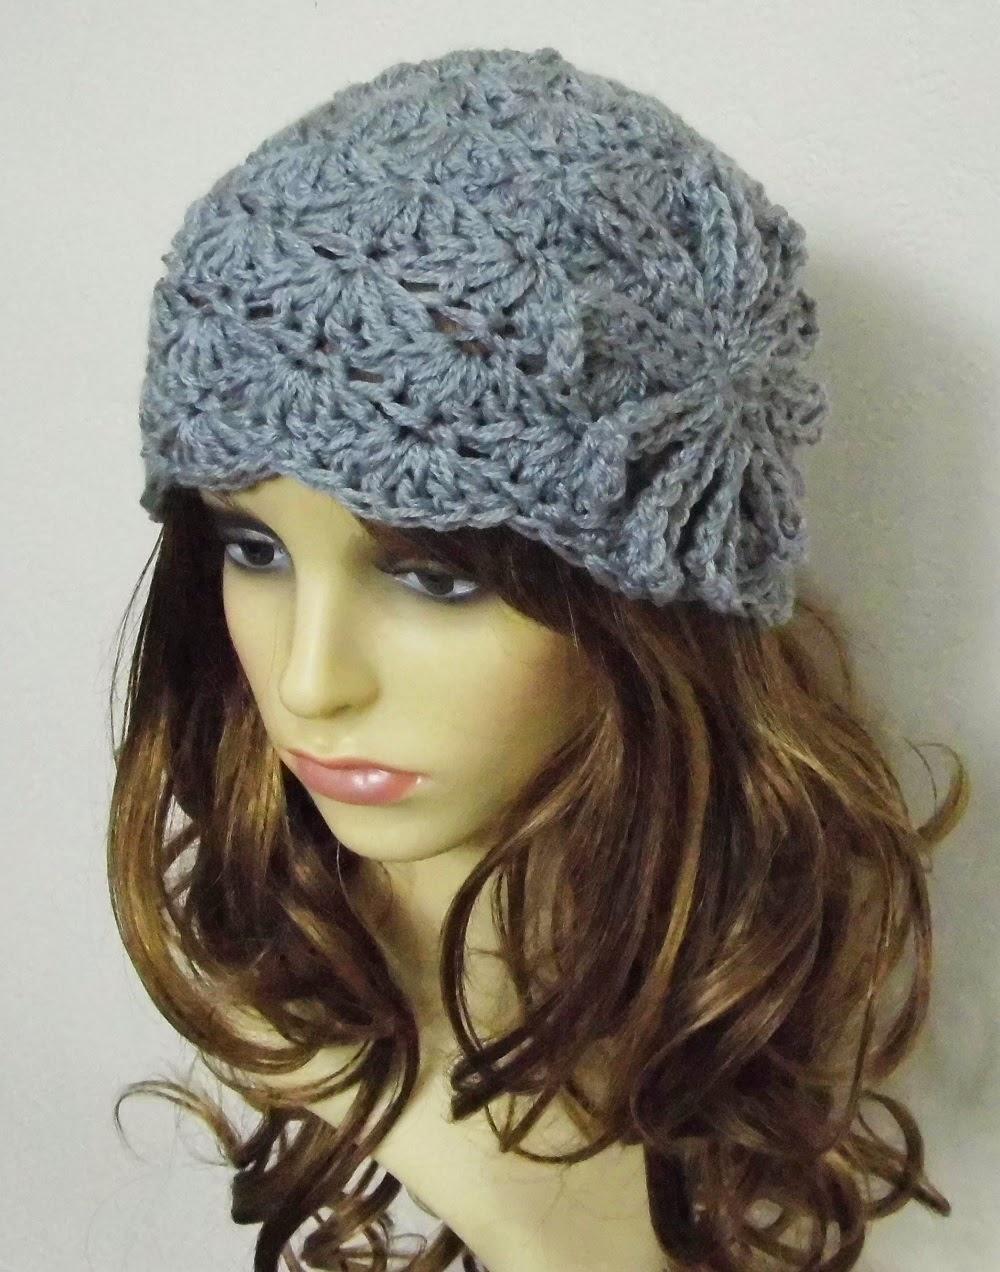 ... beanie+hat,+white+hat,+crochet+hats,+hats,+crochet+hat,+adult+hat..JPG